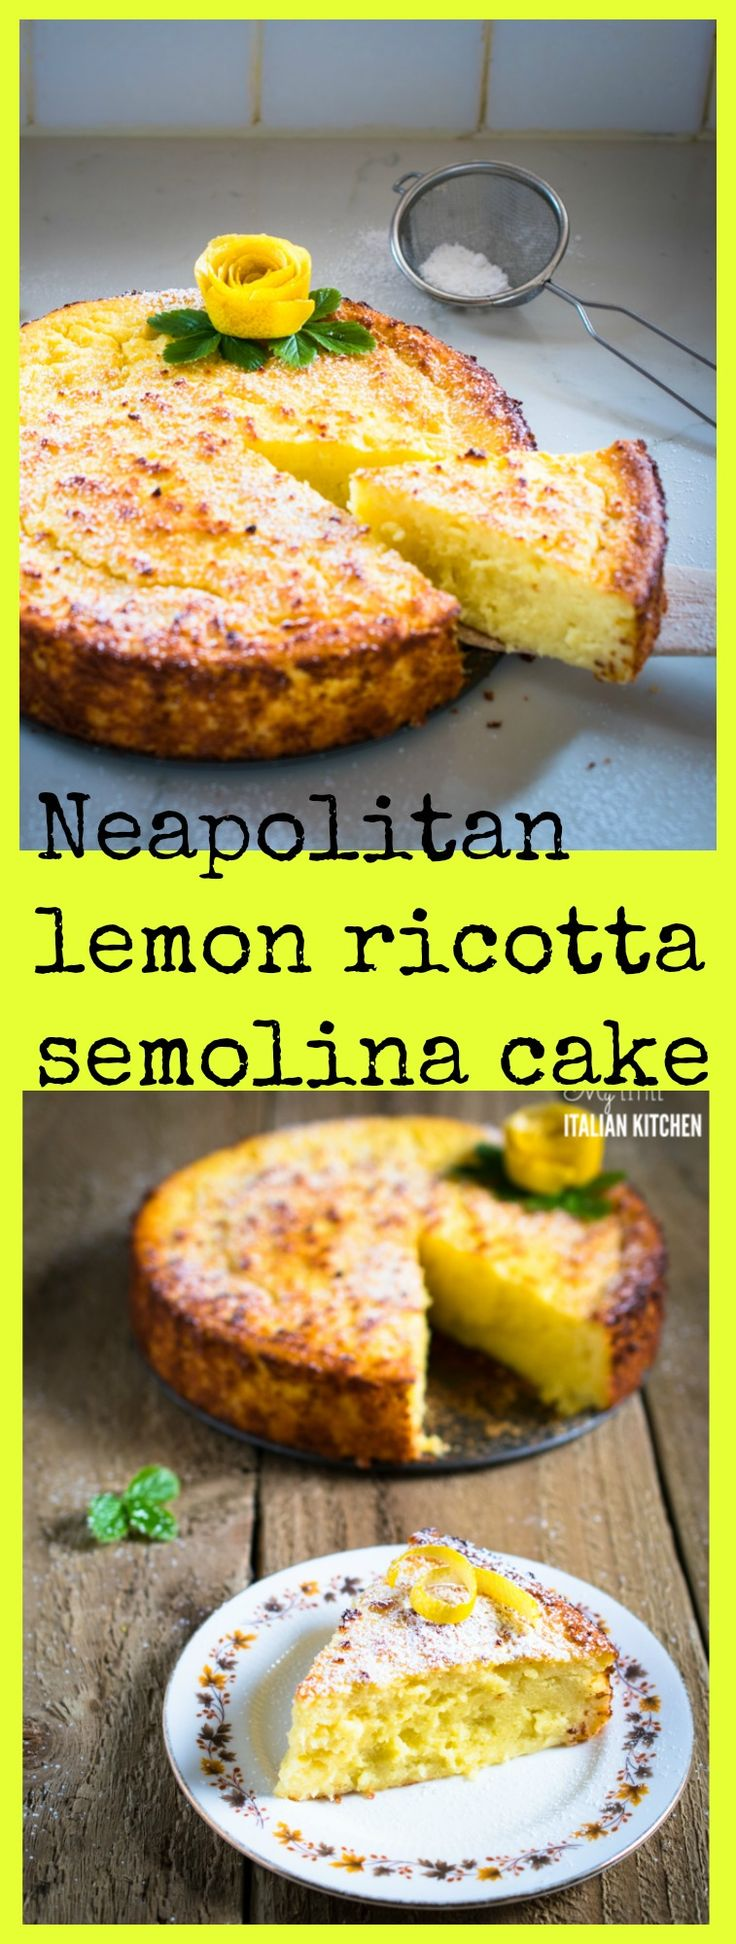 Delicious Neapolitan lemon ricotta semolina cake.